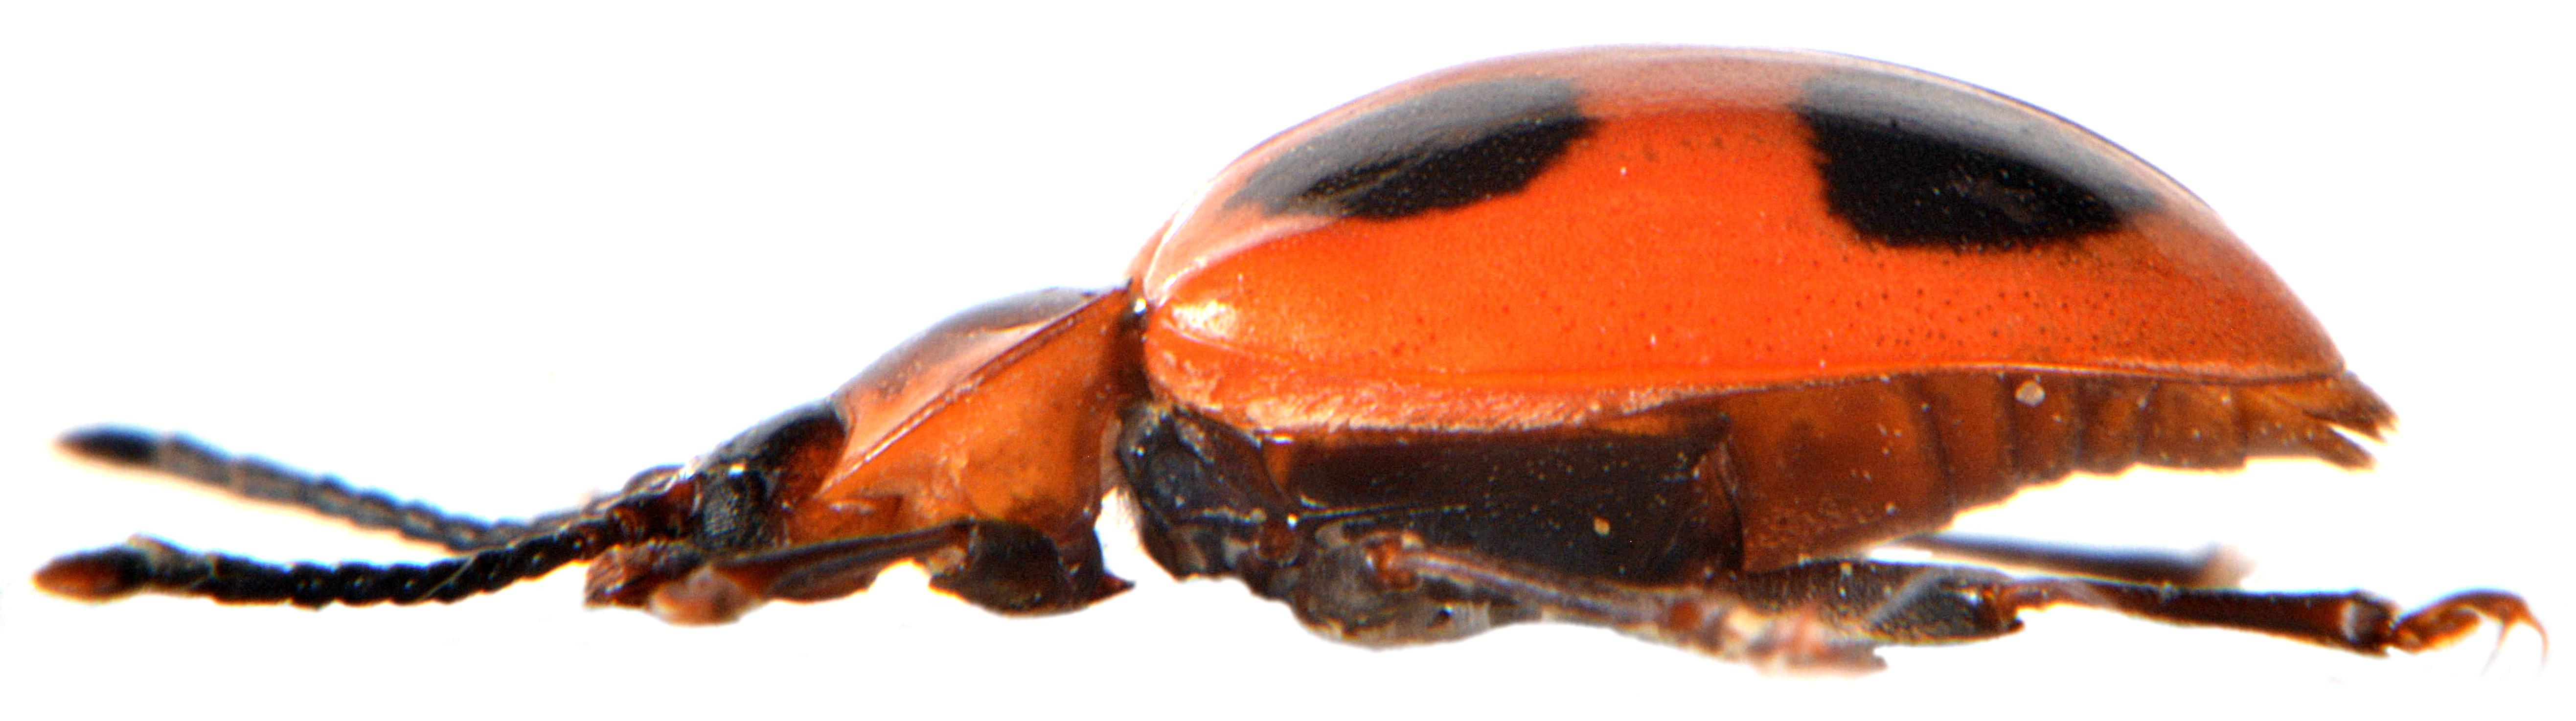 Endomychus coccineus 5